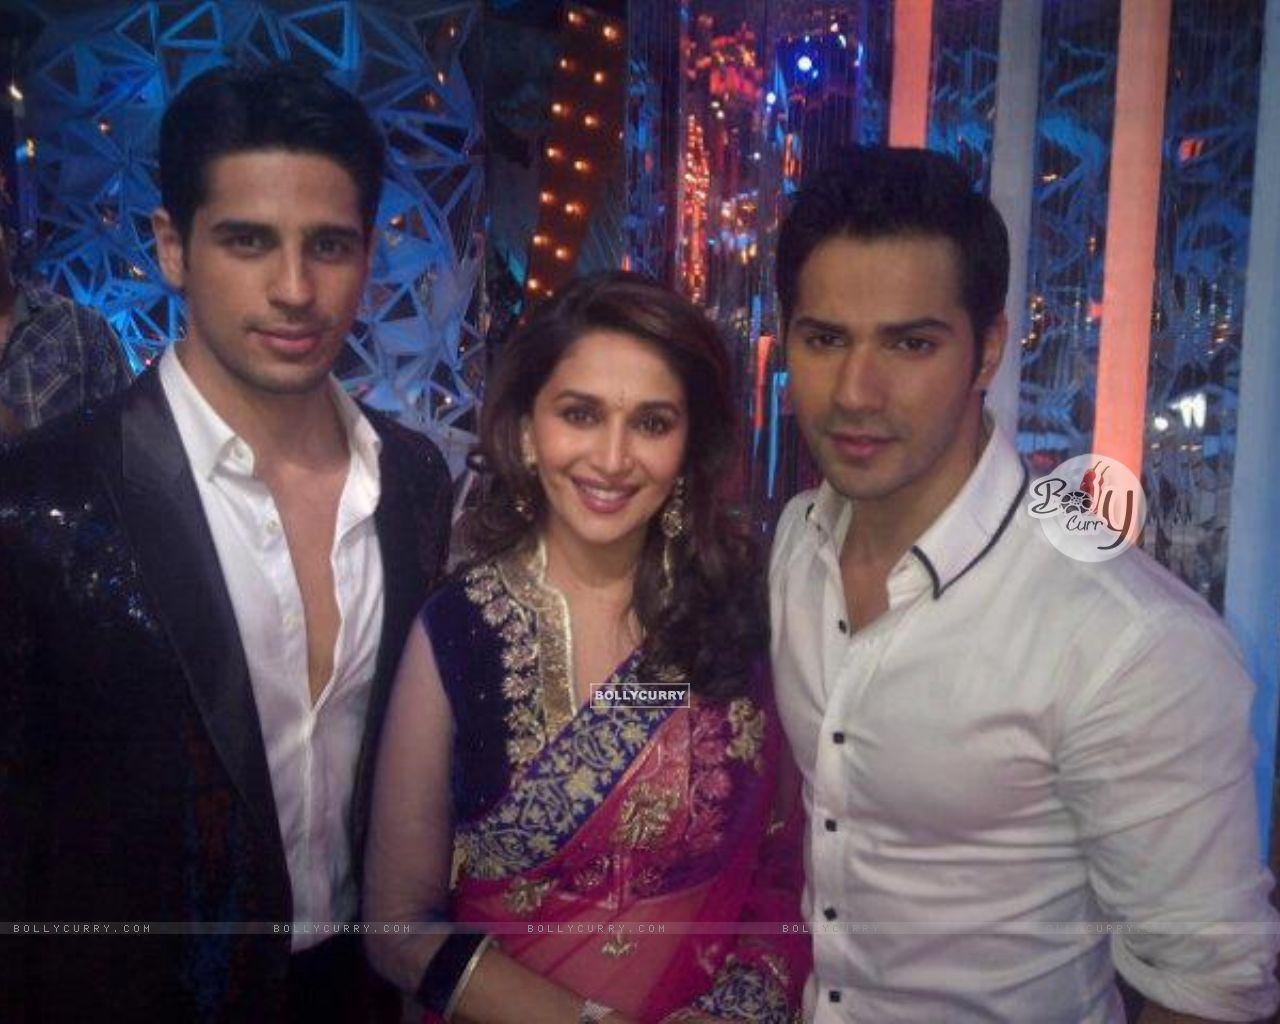 Siddharth Malhotra And Varun Dhawan With